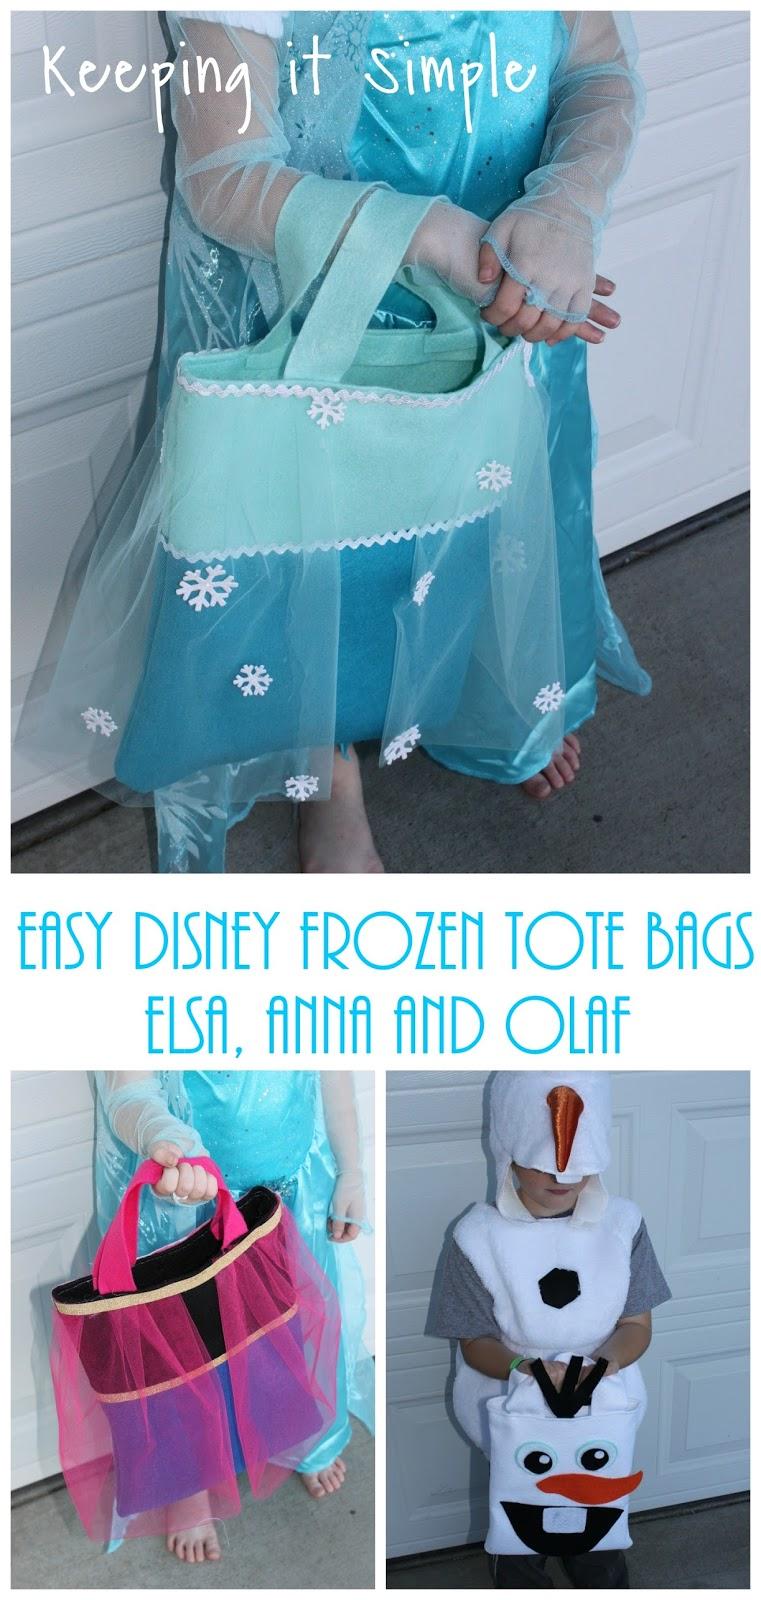 e5f02fd351 Easy Disney Frozen Tote Bags- Elsa